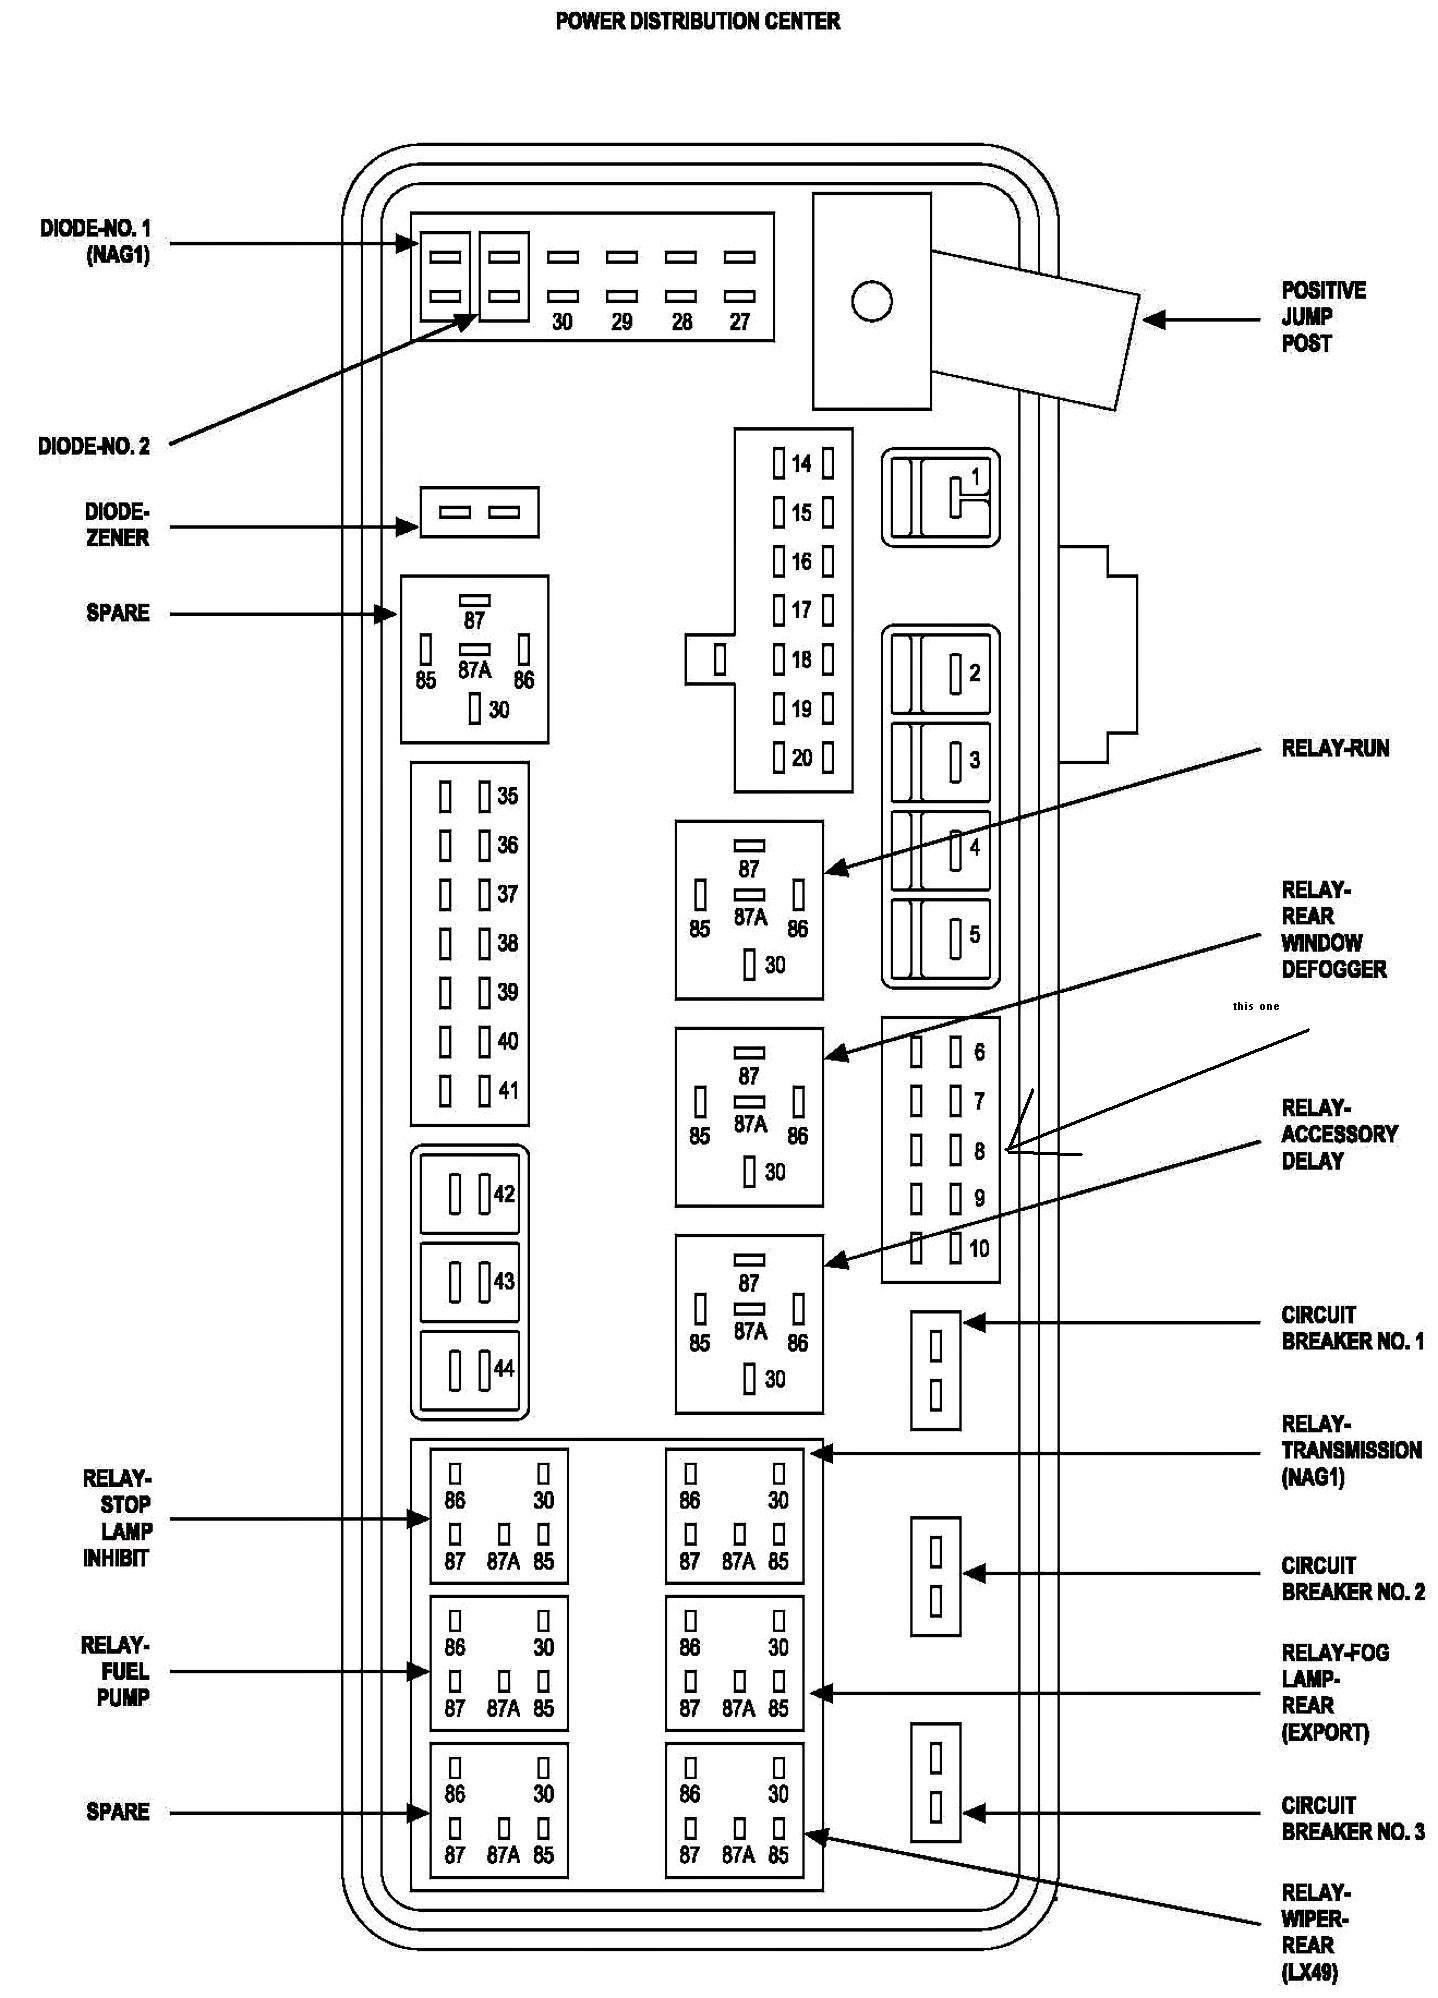 Terrific 1989 Dodge Ram Fuse Box Wiring Diagram Wiring Cloud Timewinrebemohammedshrineorg